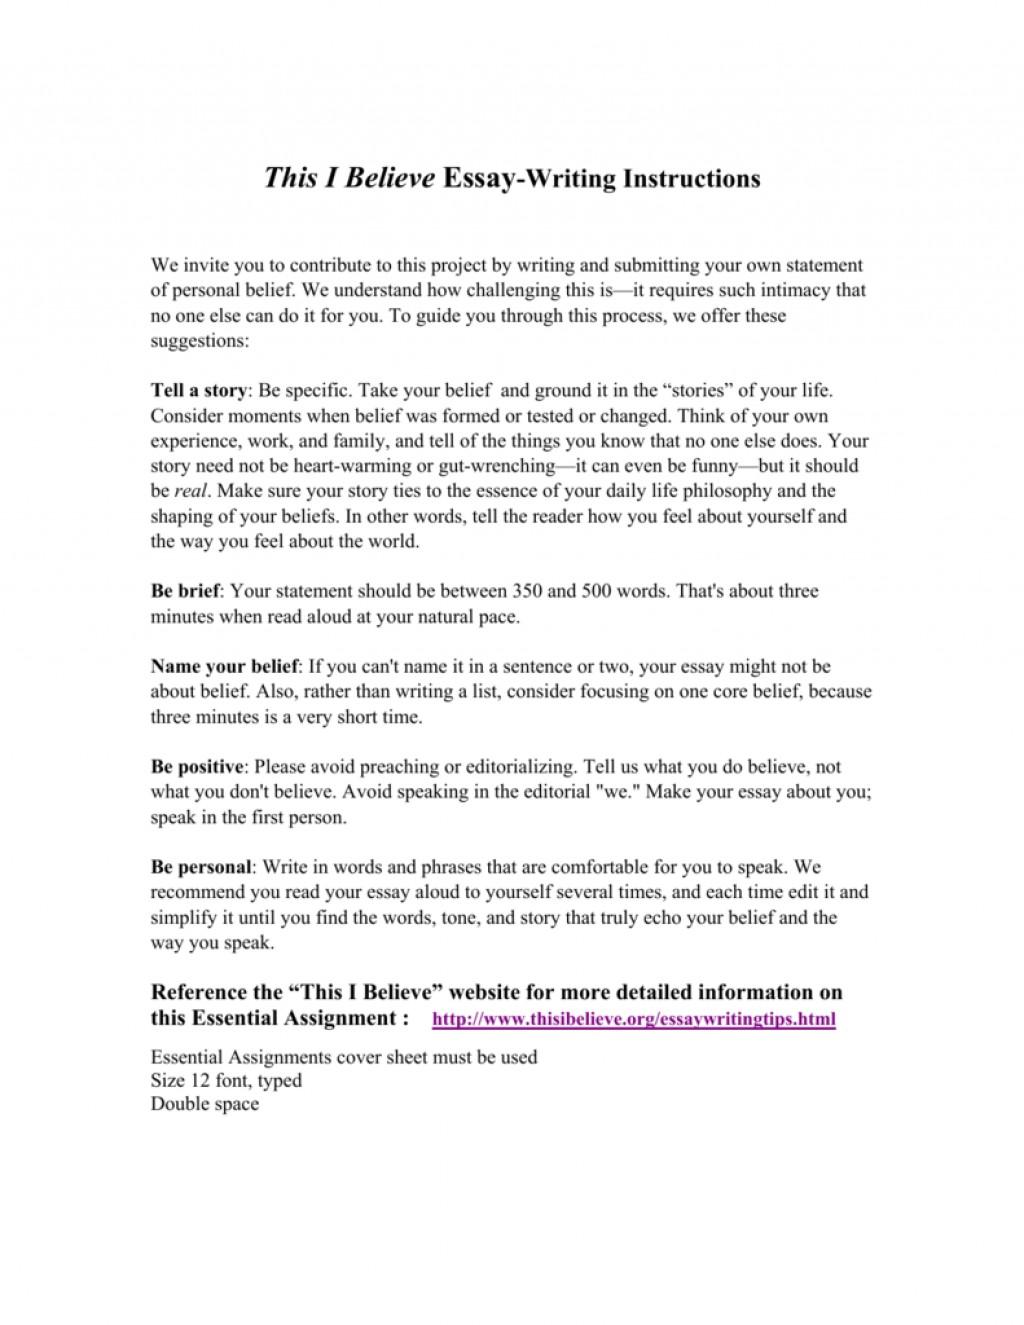 017 This I Believe Essays 008807219 1 Stupendous Essay Examples Npr College Large